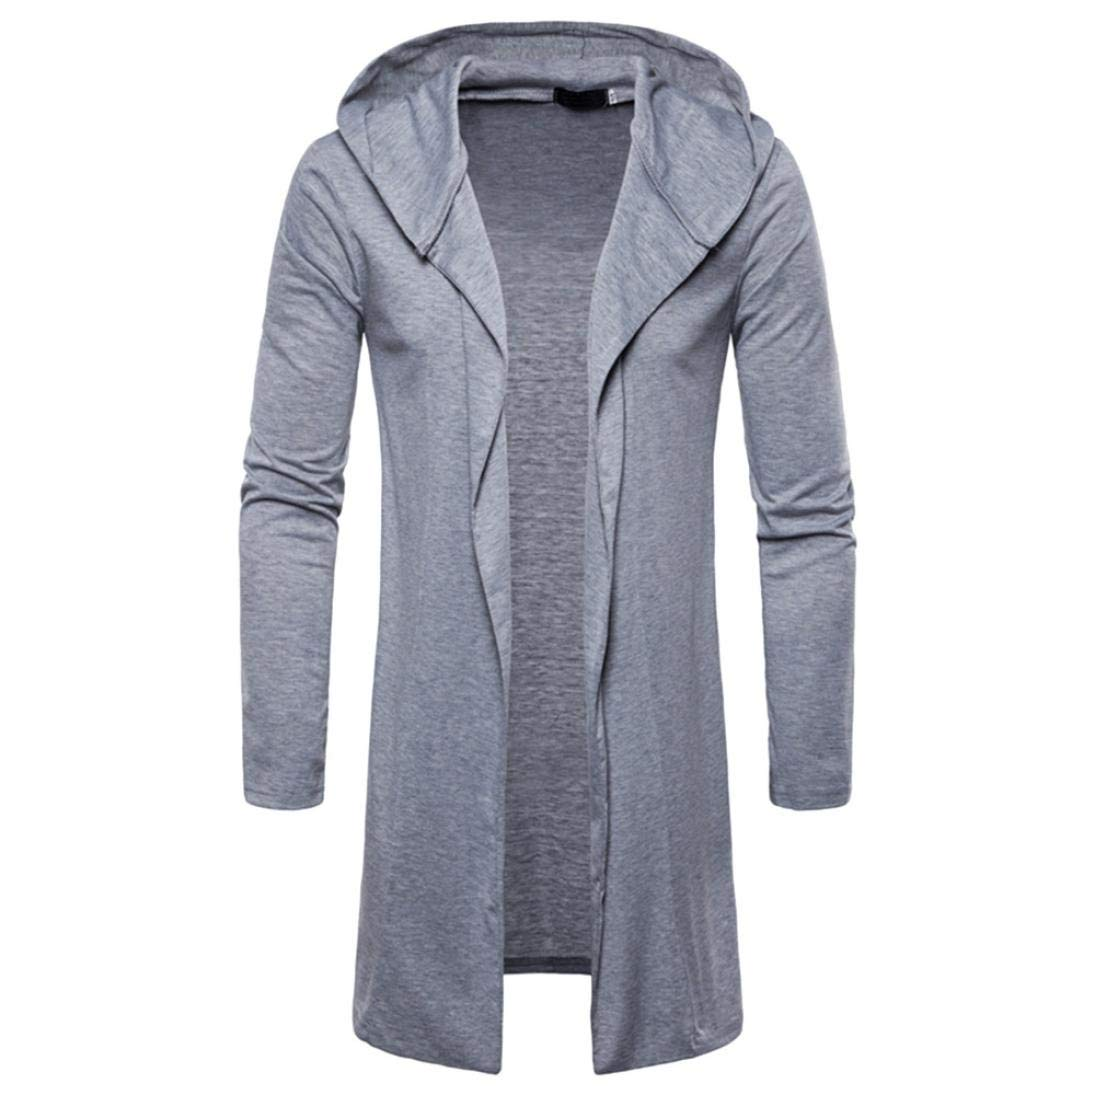 Mens Long Sweatshirt,Realdo Casual Autumn Winter Solid Slim Trench Coat Jacket Cardigan Long Sleeve Outwear(Medium,Gray)